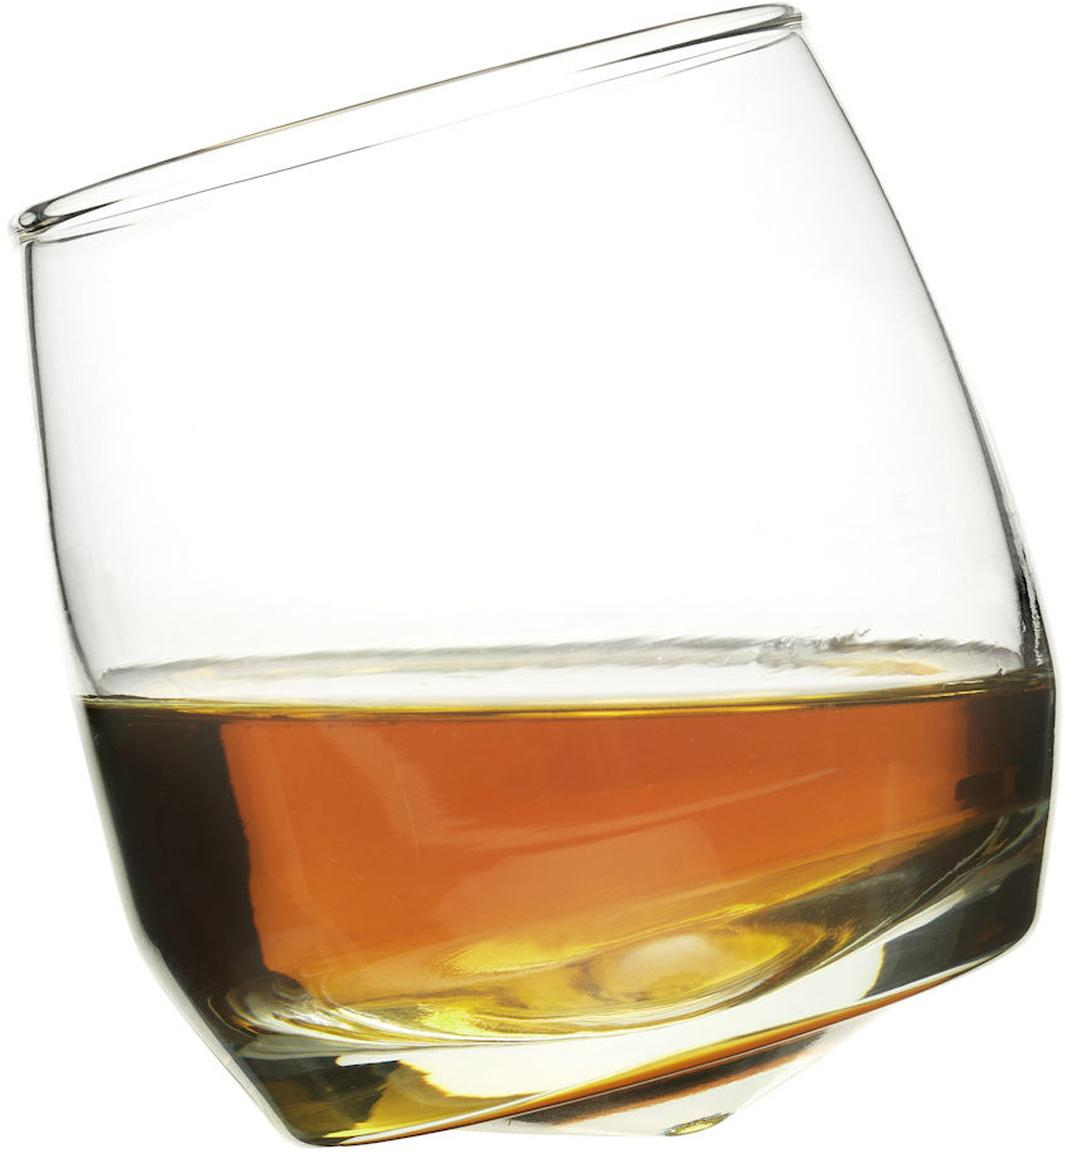 Whiskeygläser Rocking, 6 Stück, Mundgeblasenes Glas, Transparent, Ø 7 x H 9 cm